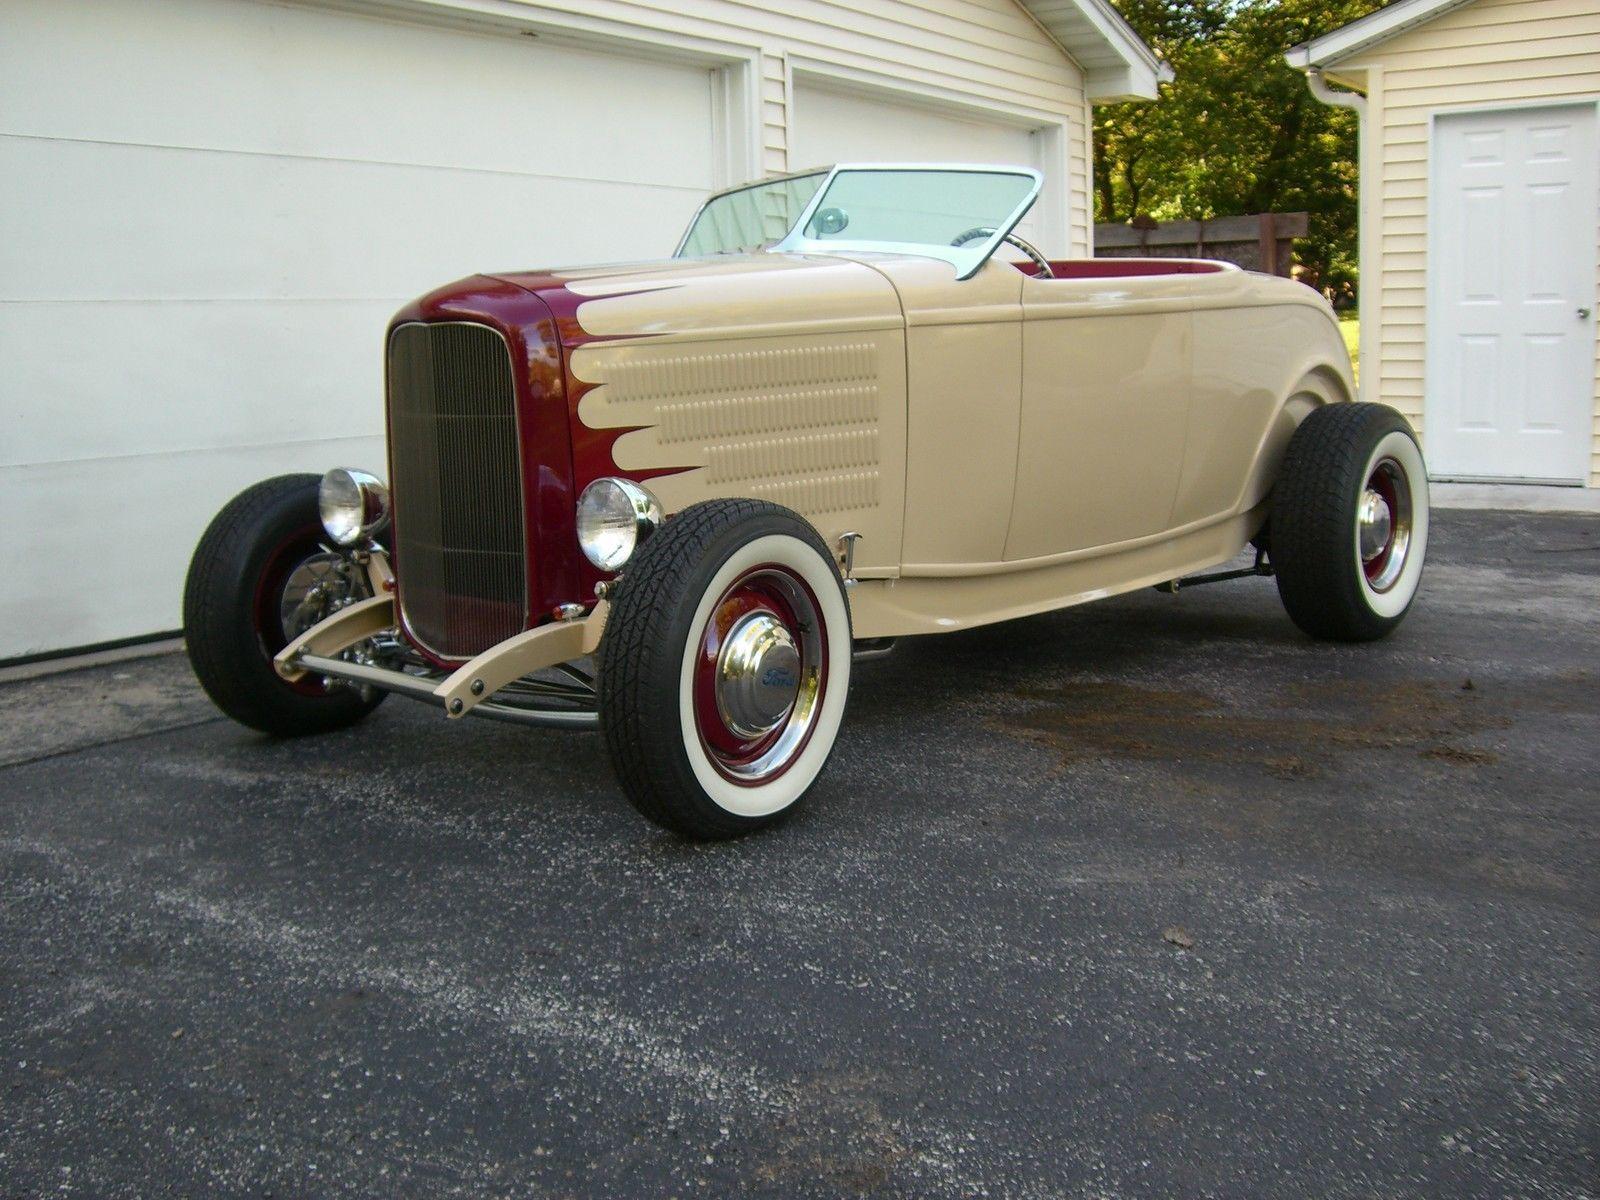 US $40,000.00 Used in eBay Motors, Cars & Trucks, Ford | genuine ...